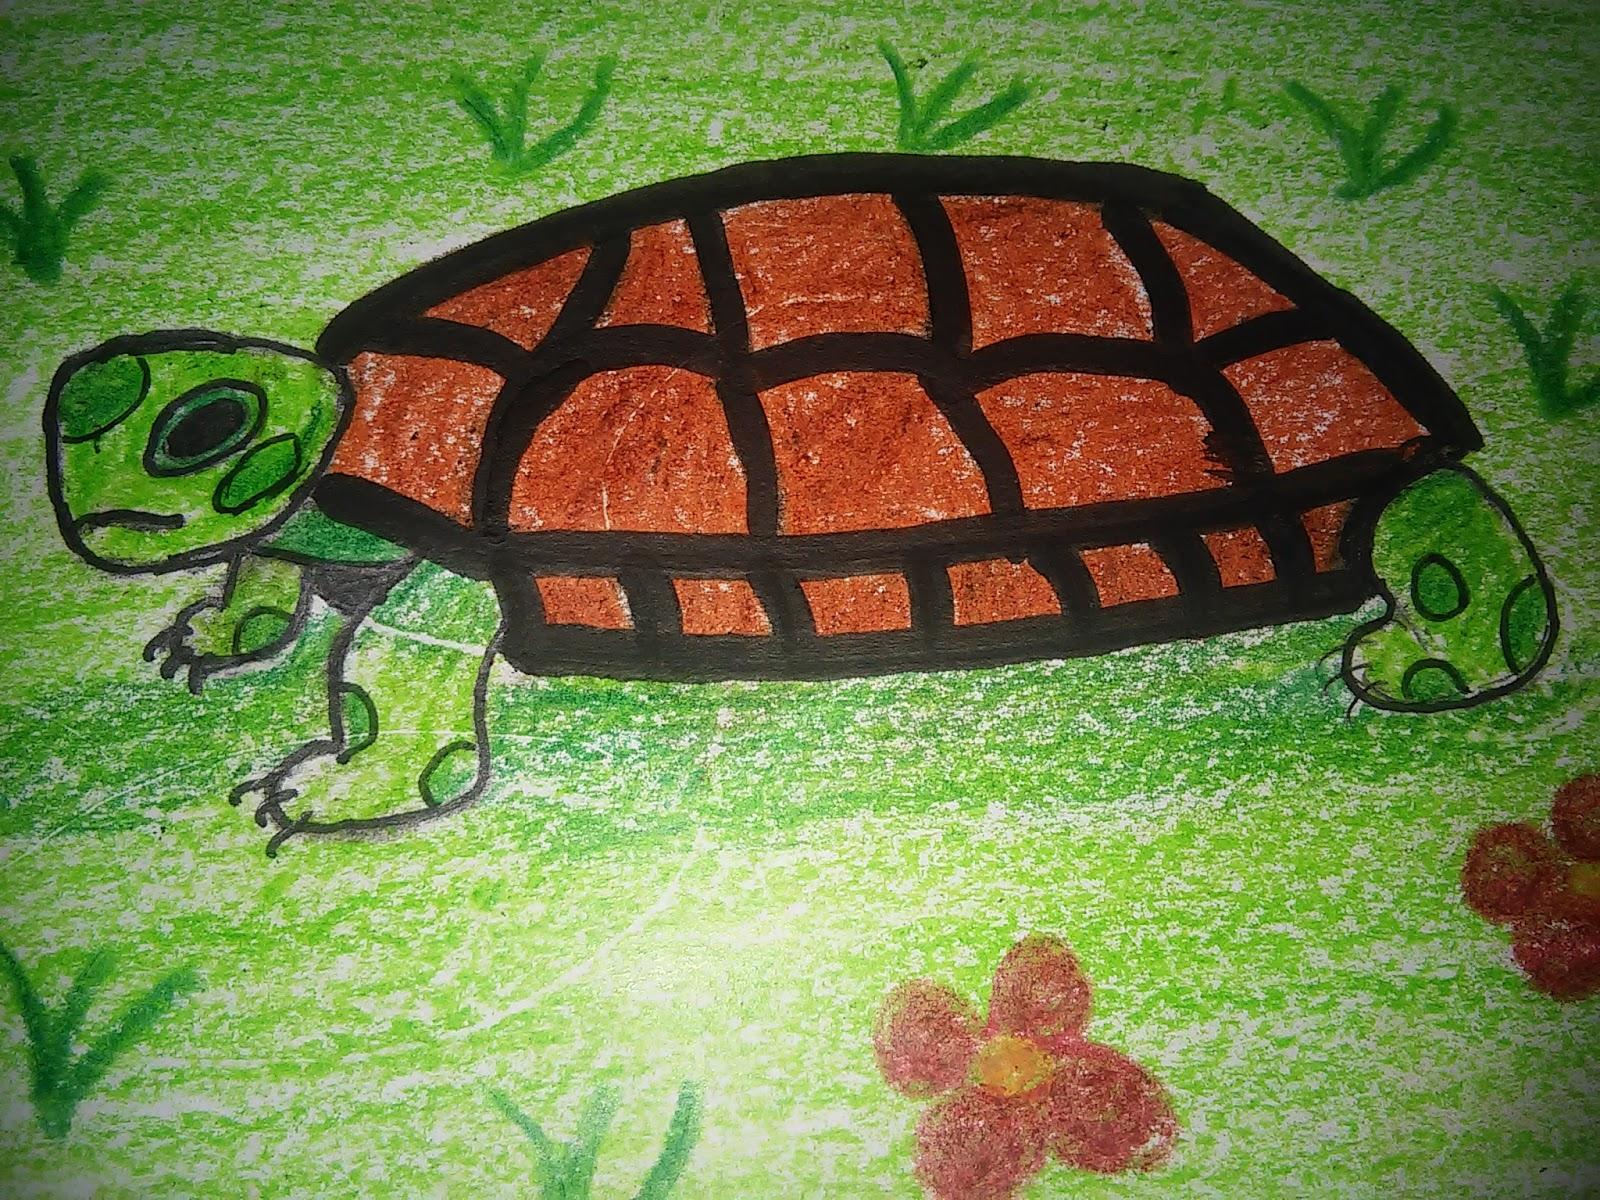 çizim Zamanı Drawing Time Renkli Kaplumbağa çizimi Drawing